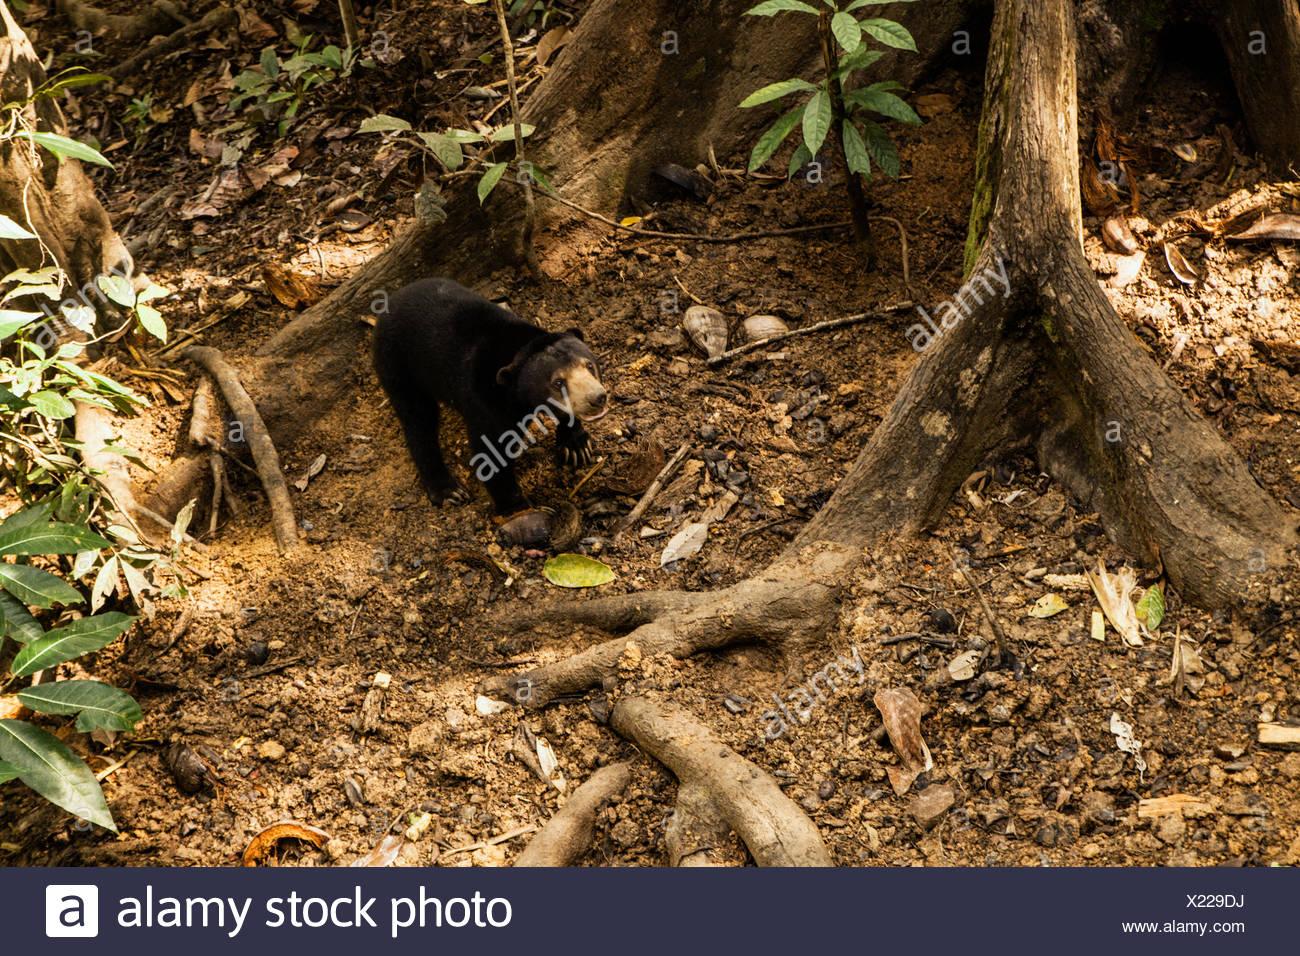 Eine Sonne Bären Bornean Sun Bear Conservation Center in Malaysia Borneo. Stockfoto